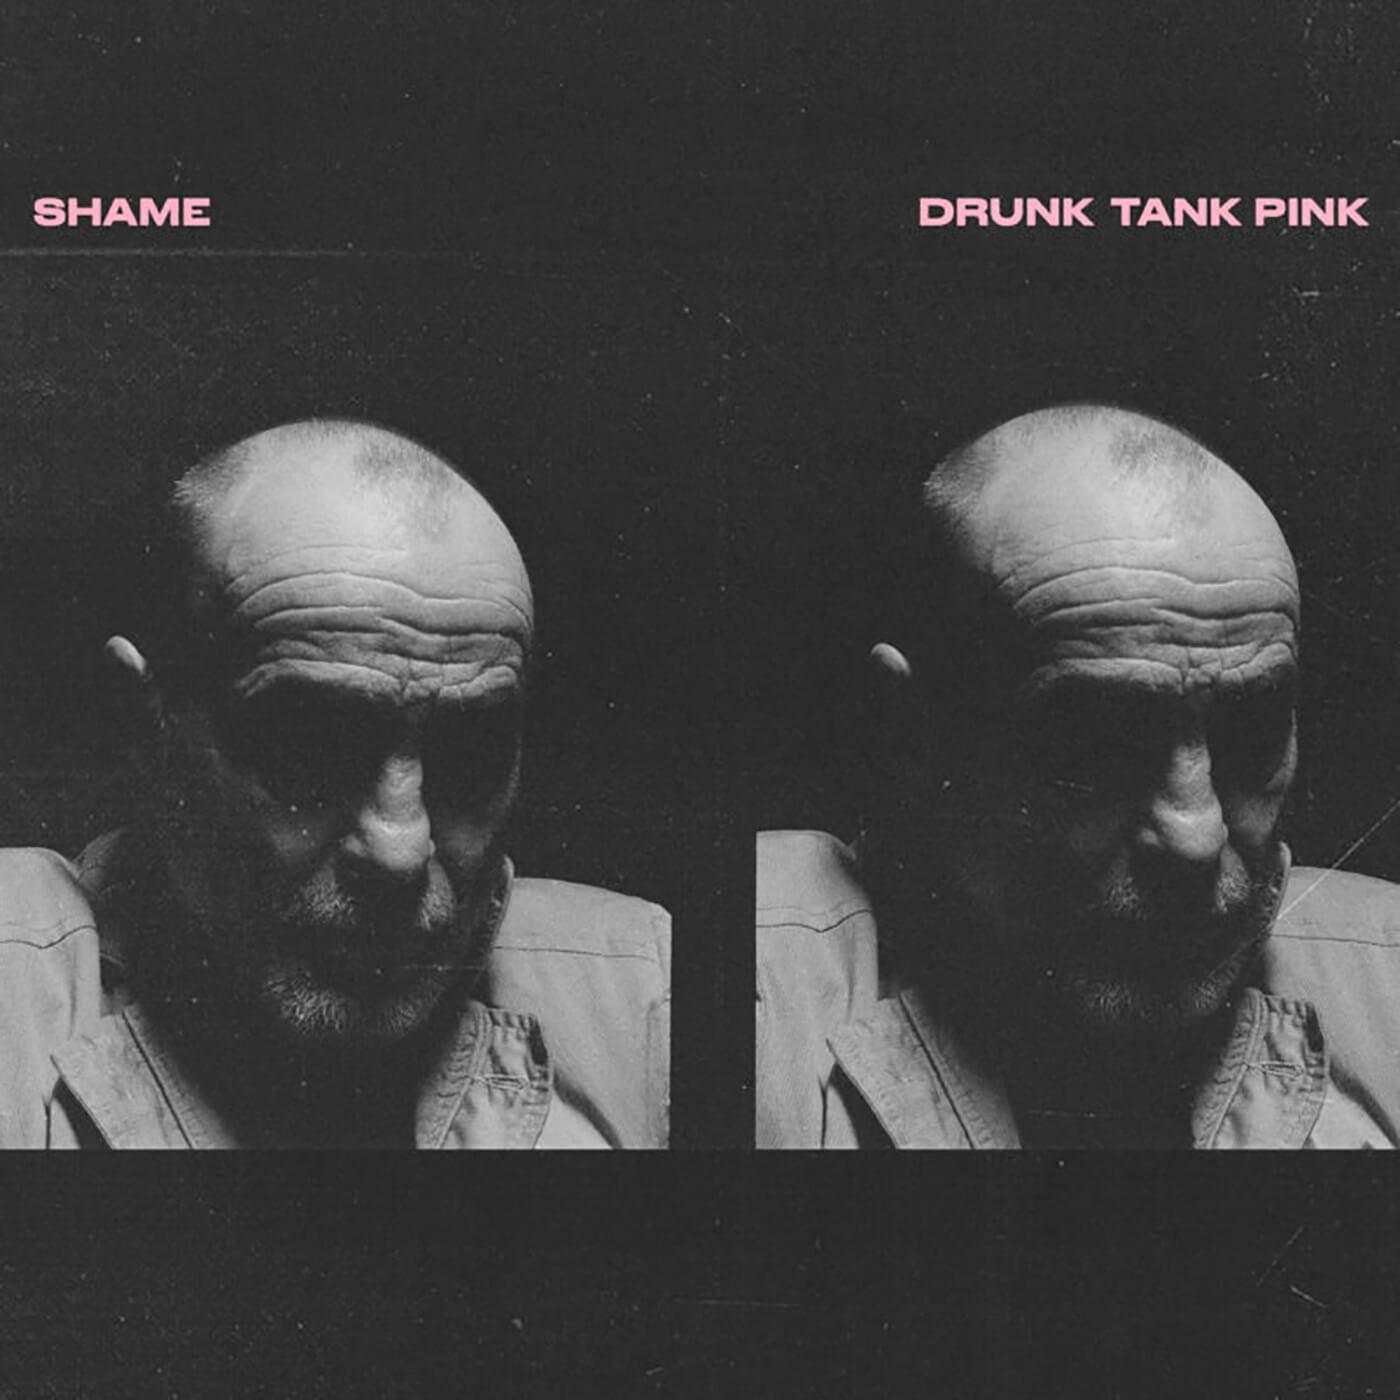 shame - drunk tank pink